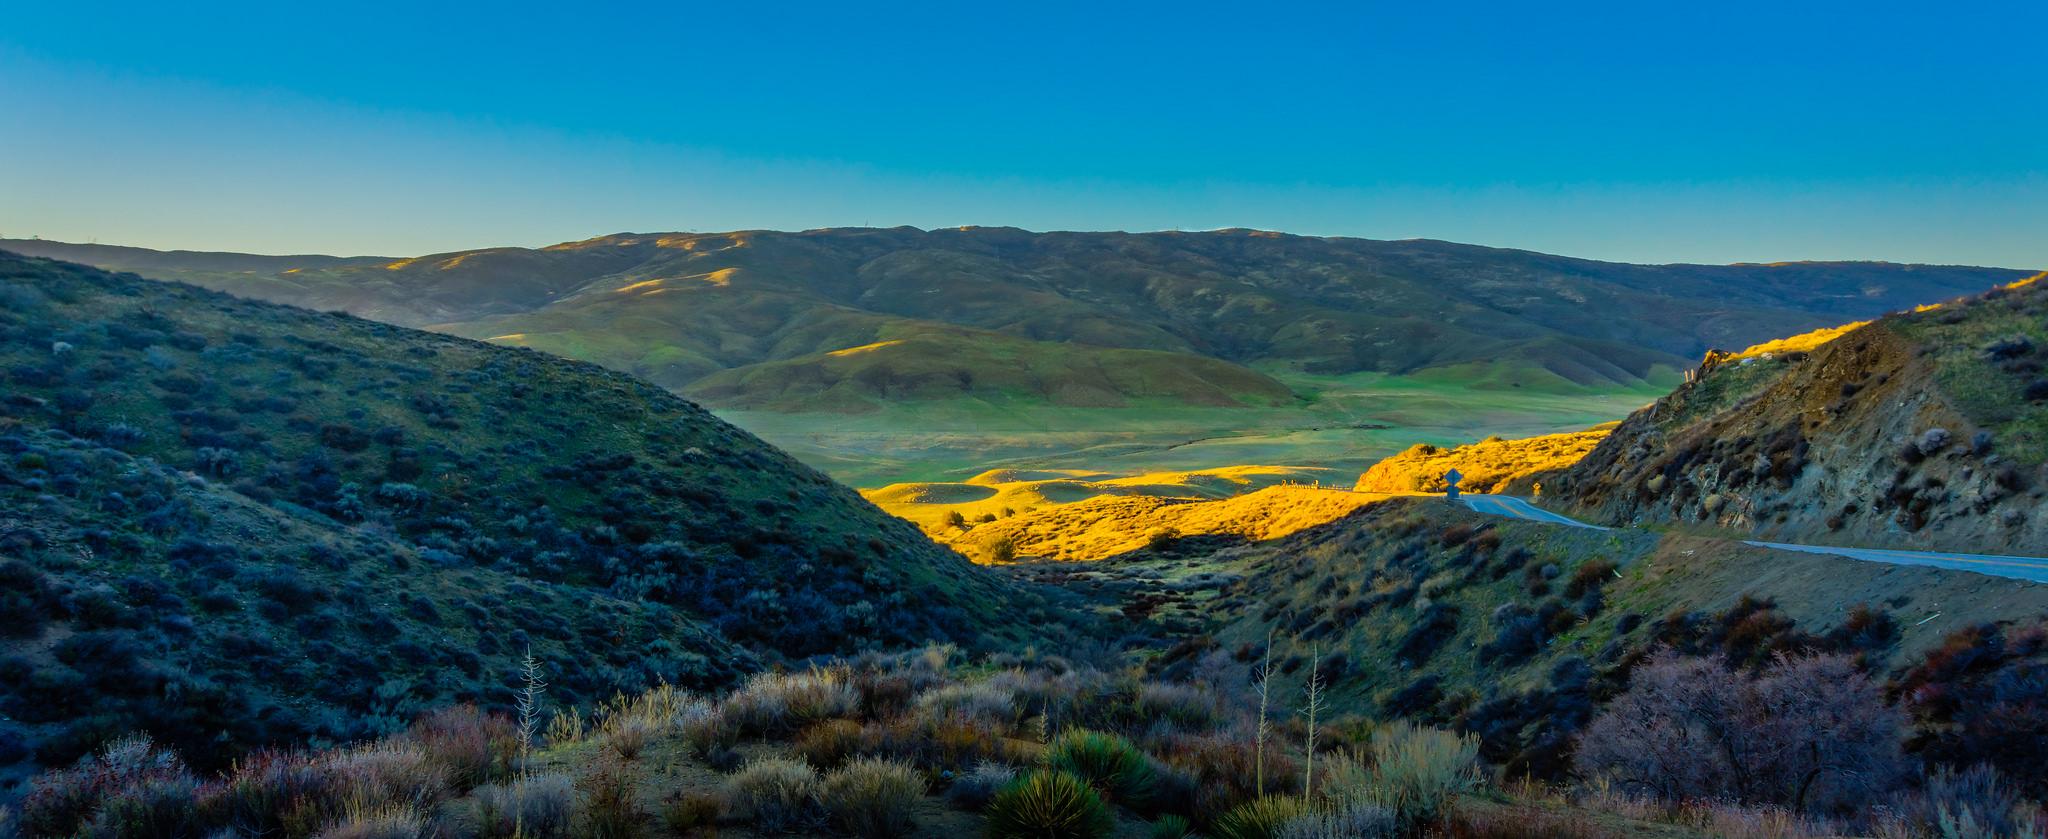 Palmdale | Ⓒ Jeff Turner/Flickr